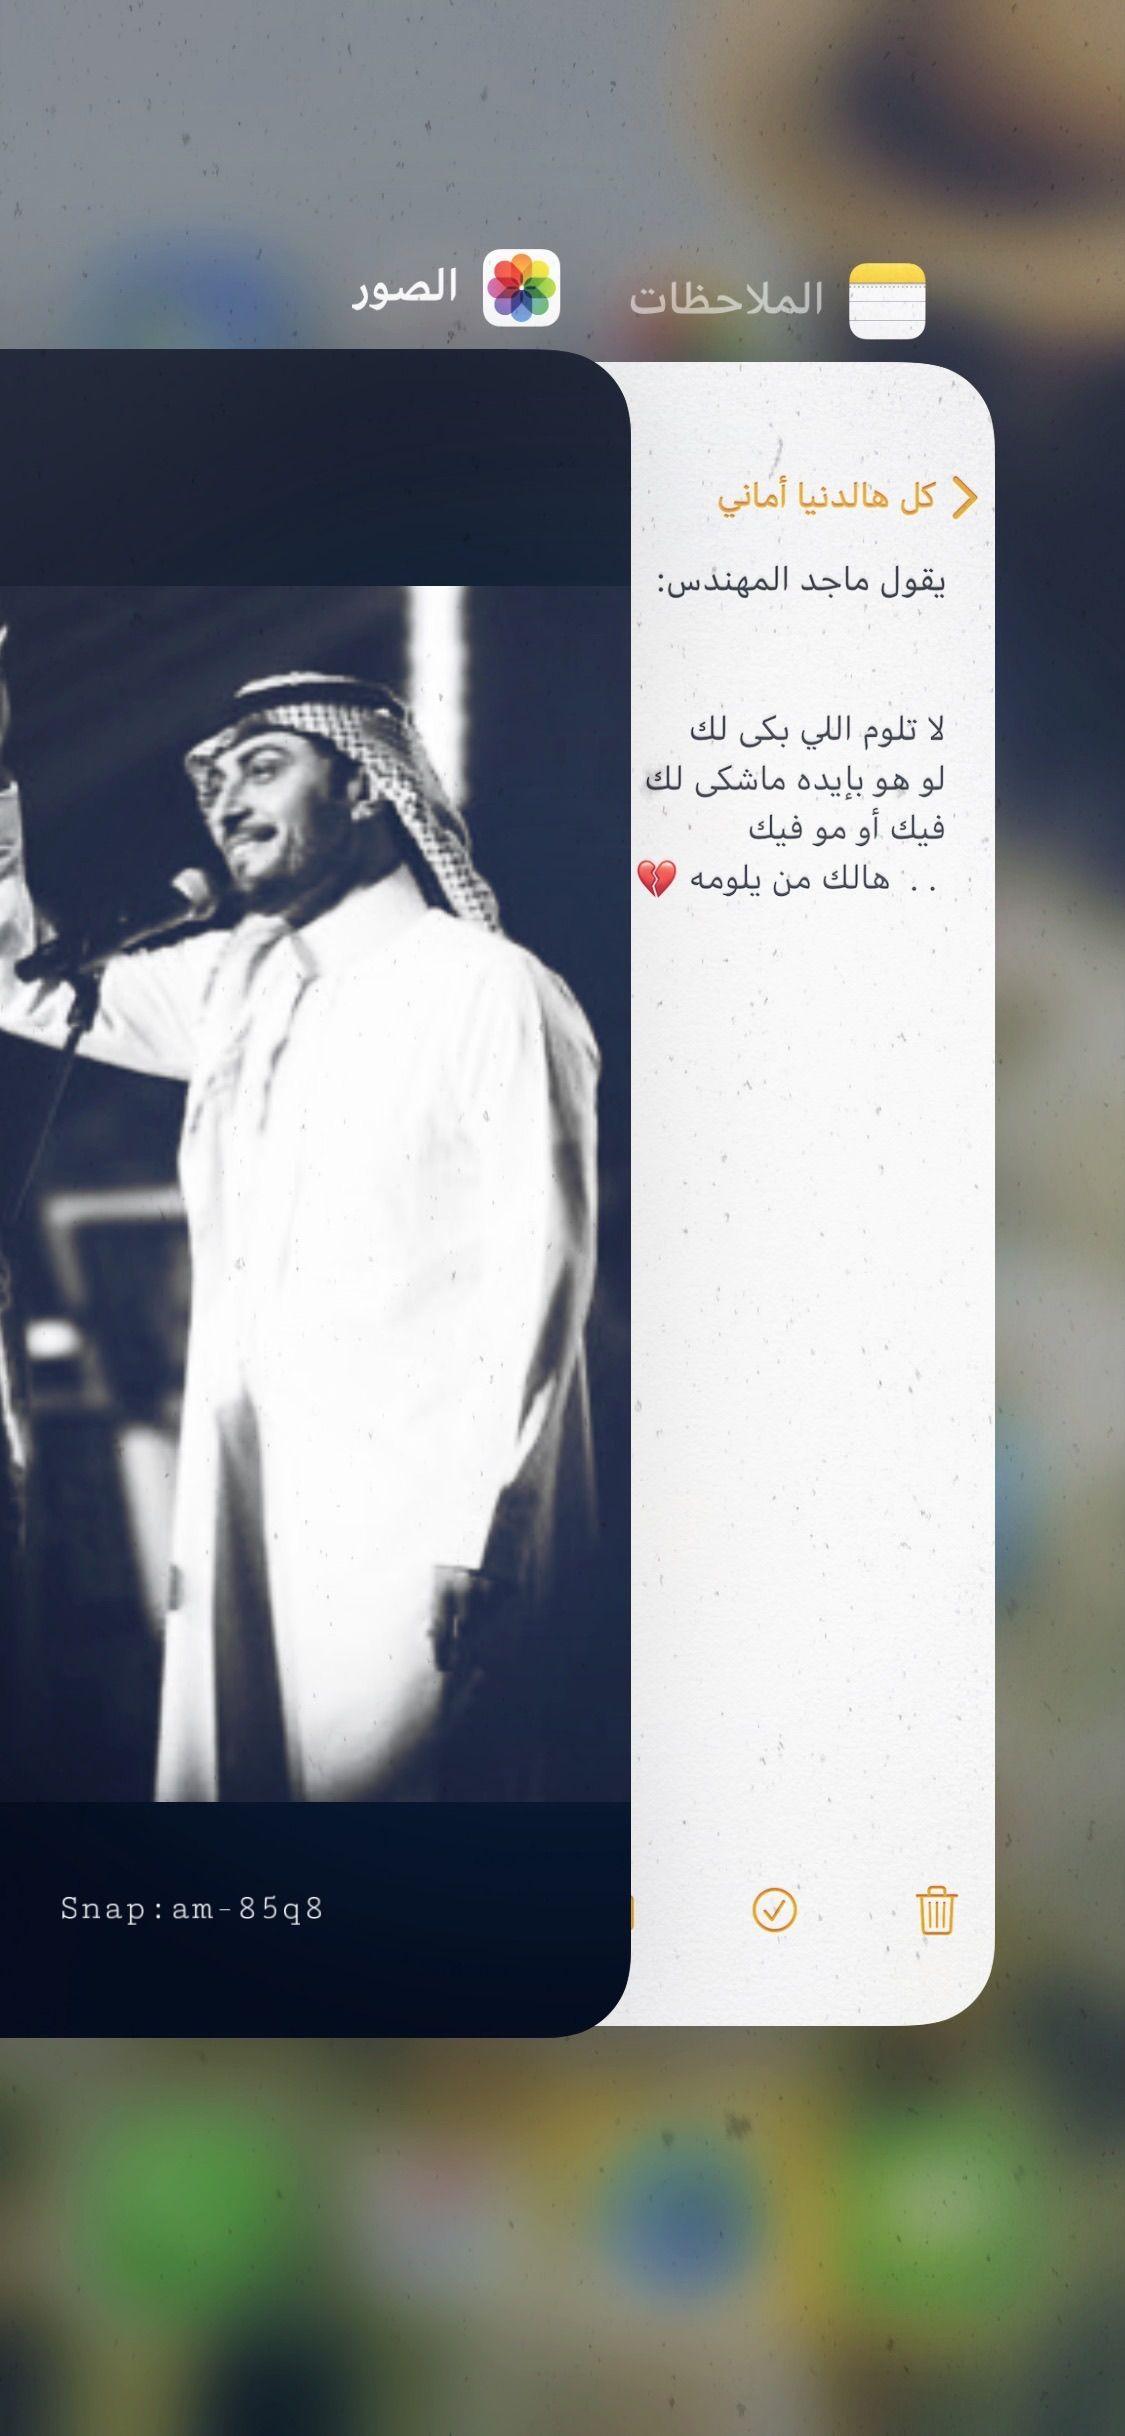 كل هالدنيا أماني In 2020 Cover Photo Quotes Beautiful Arabic Words Islamic Love Quotes